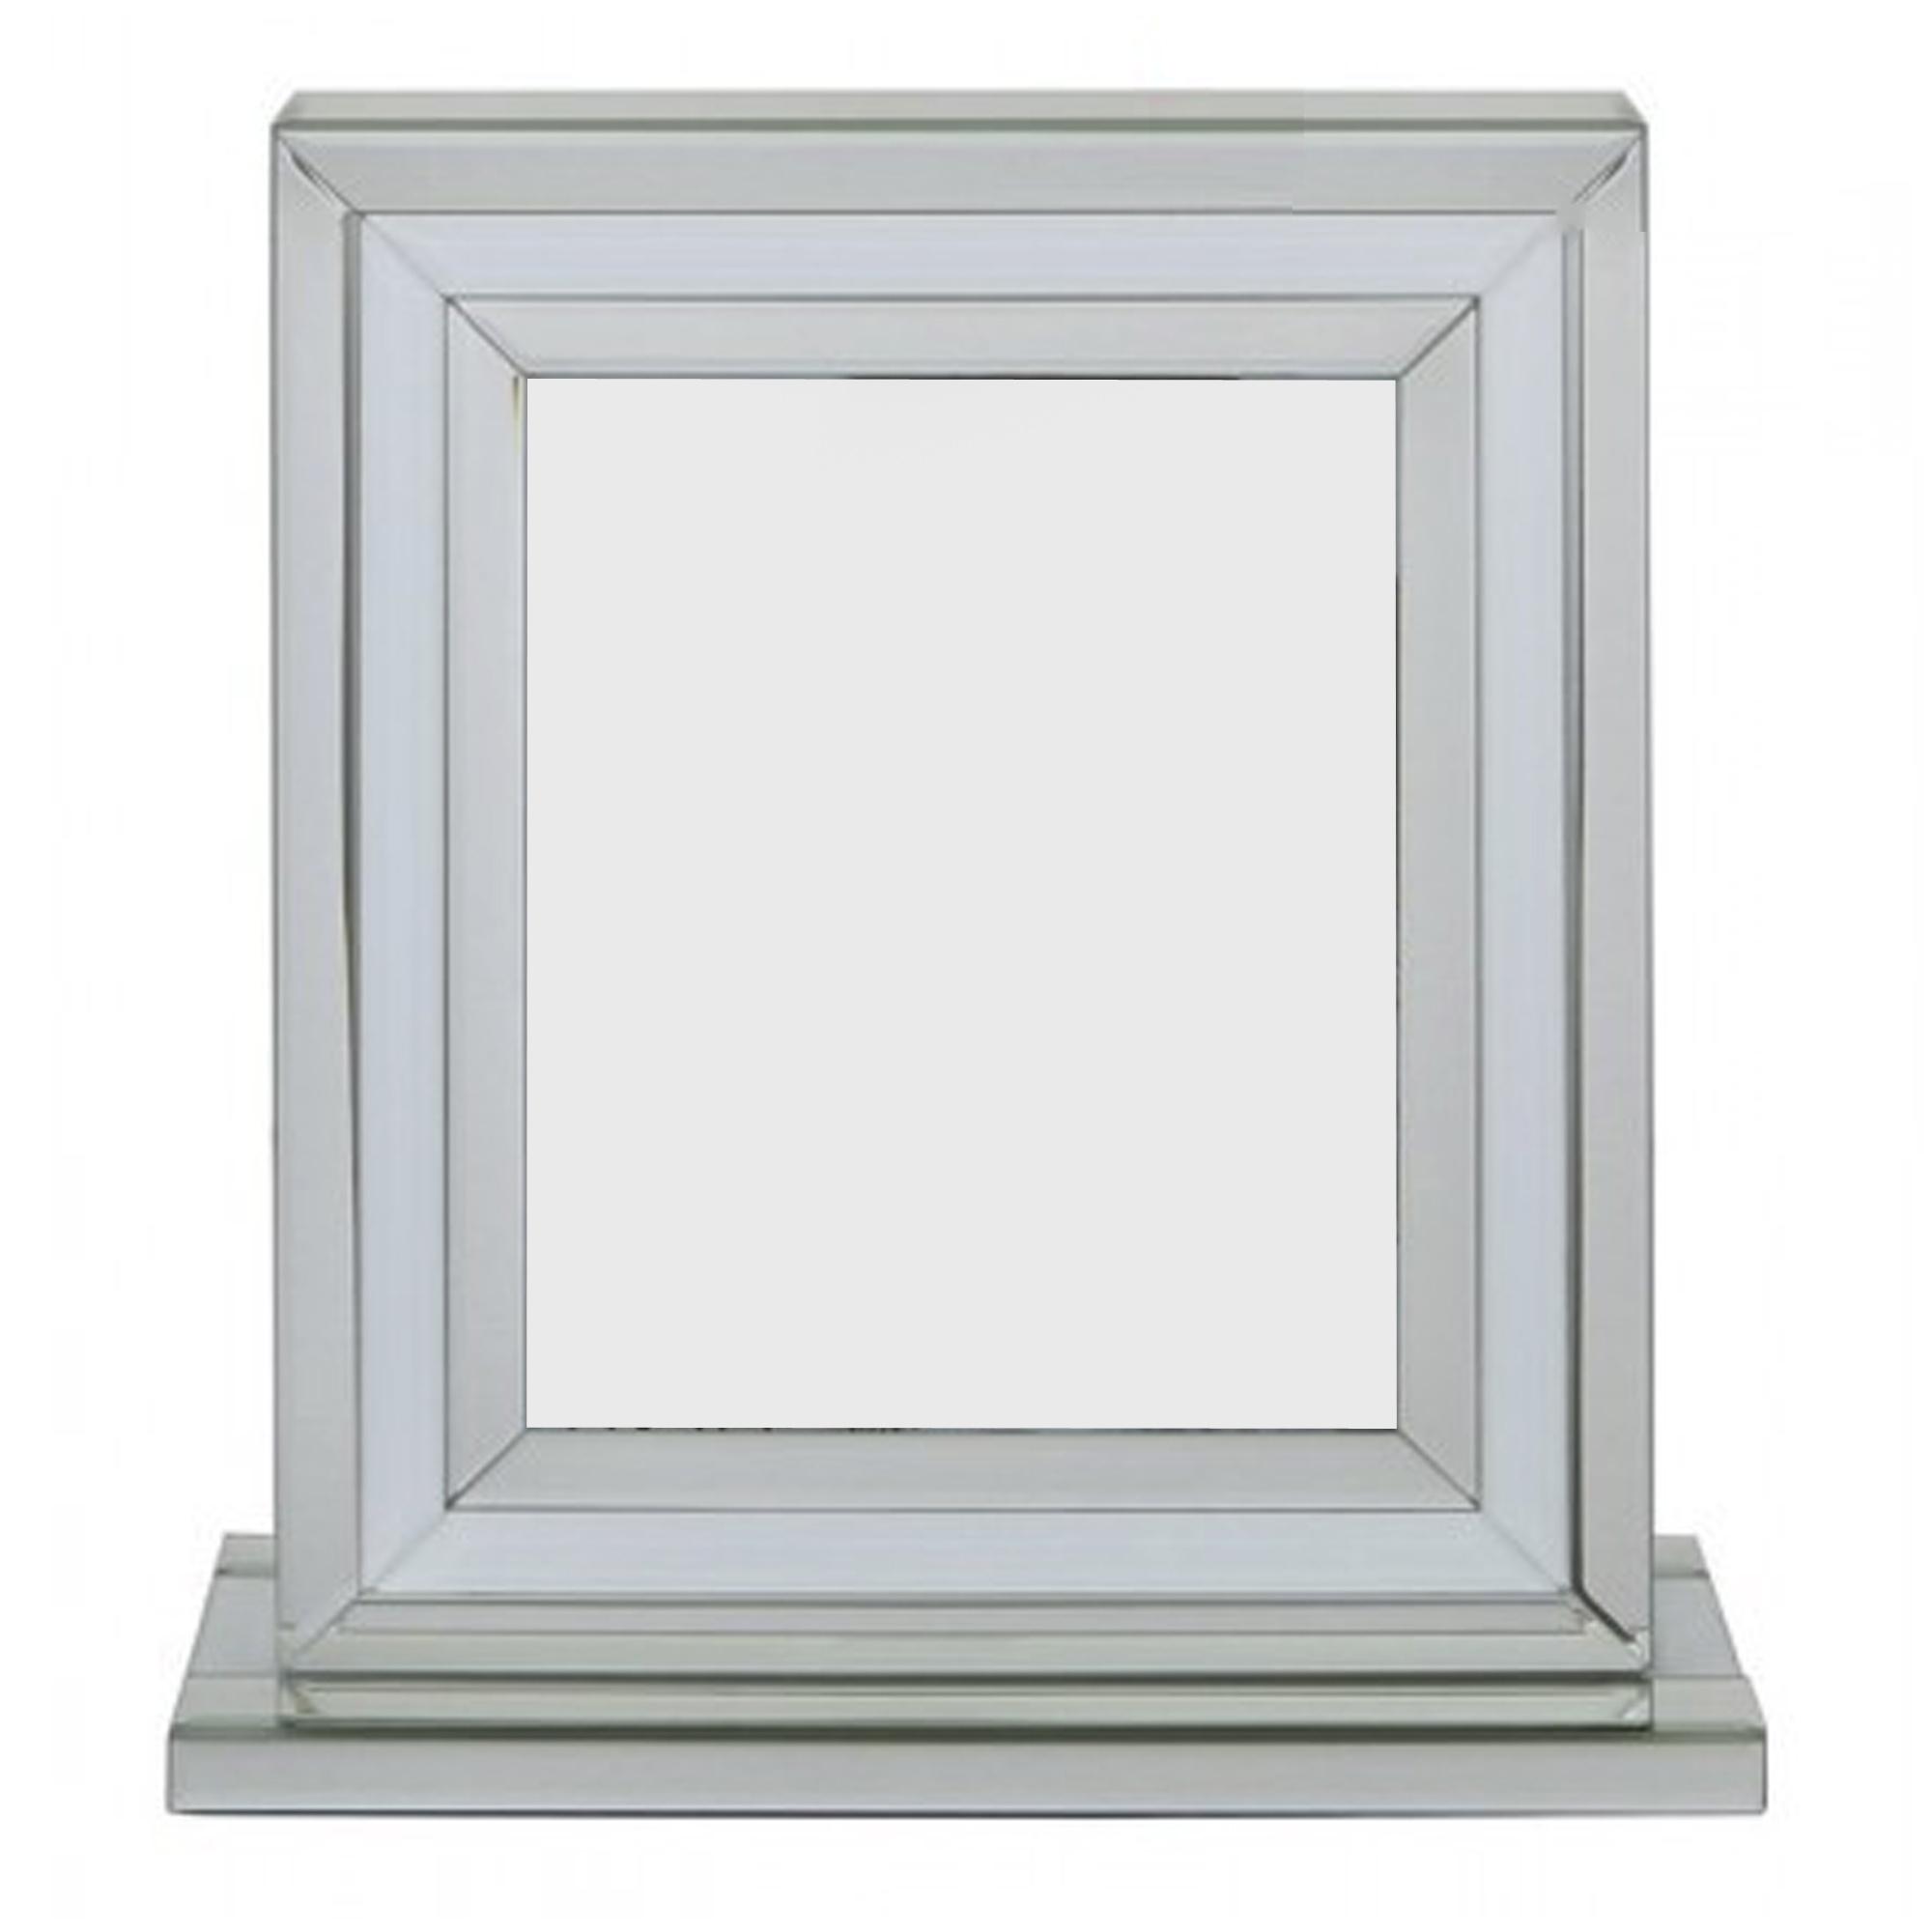 Alghero White Large Mirrored Photo Frame | Frames